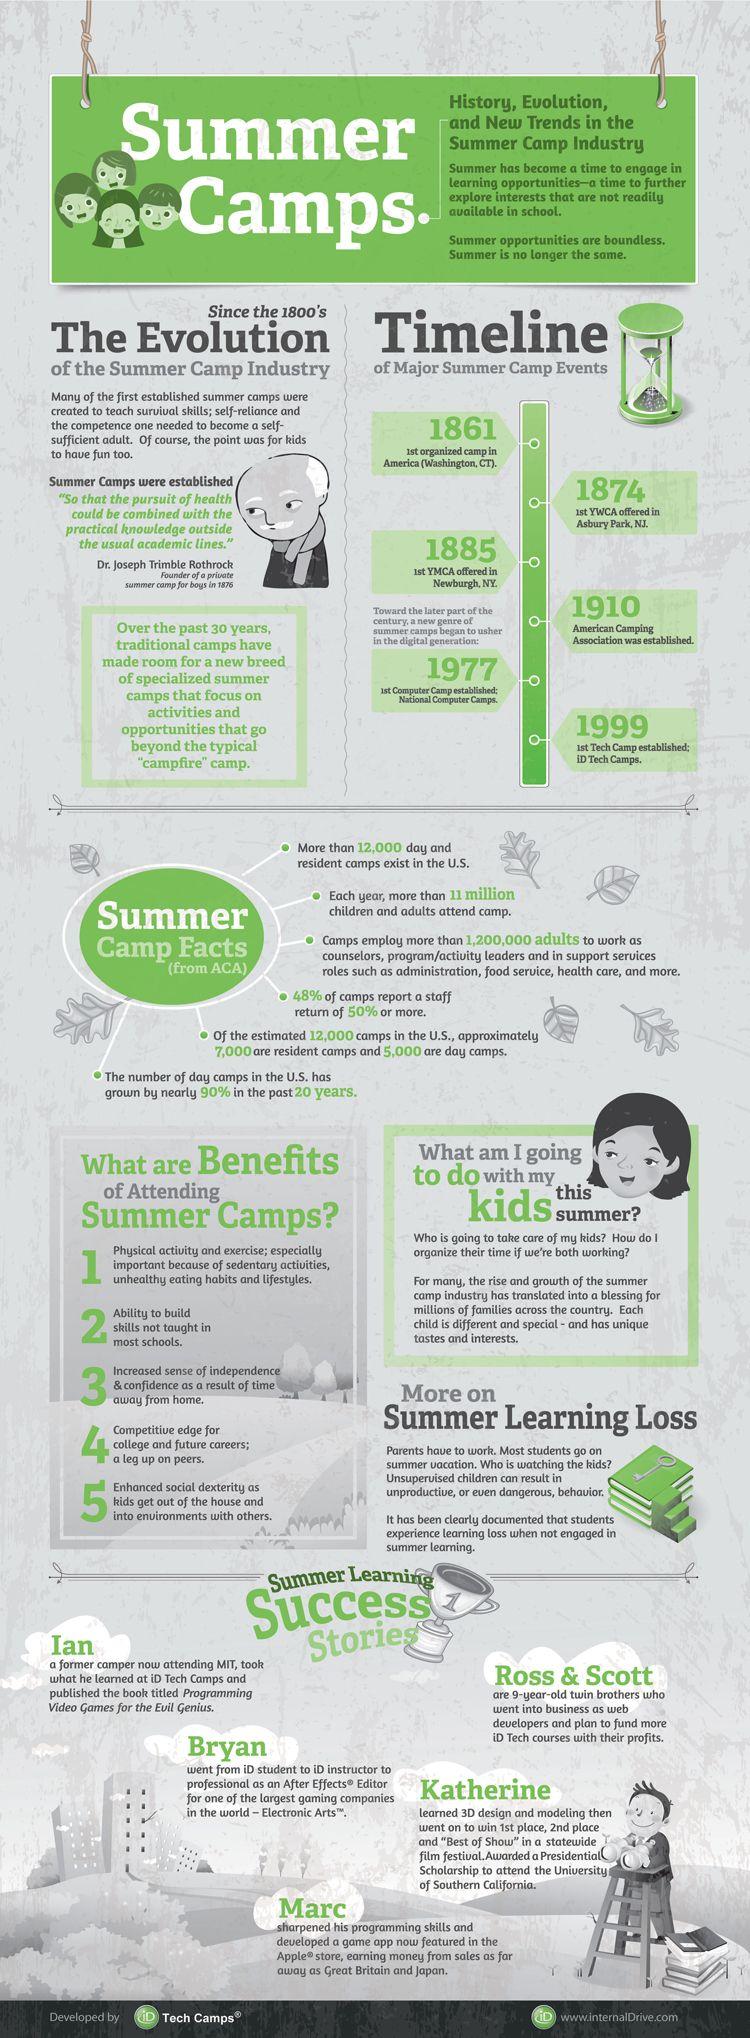 125 Creative Summer Camp Names Summer Camp Summer Learning Loss